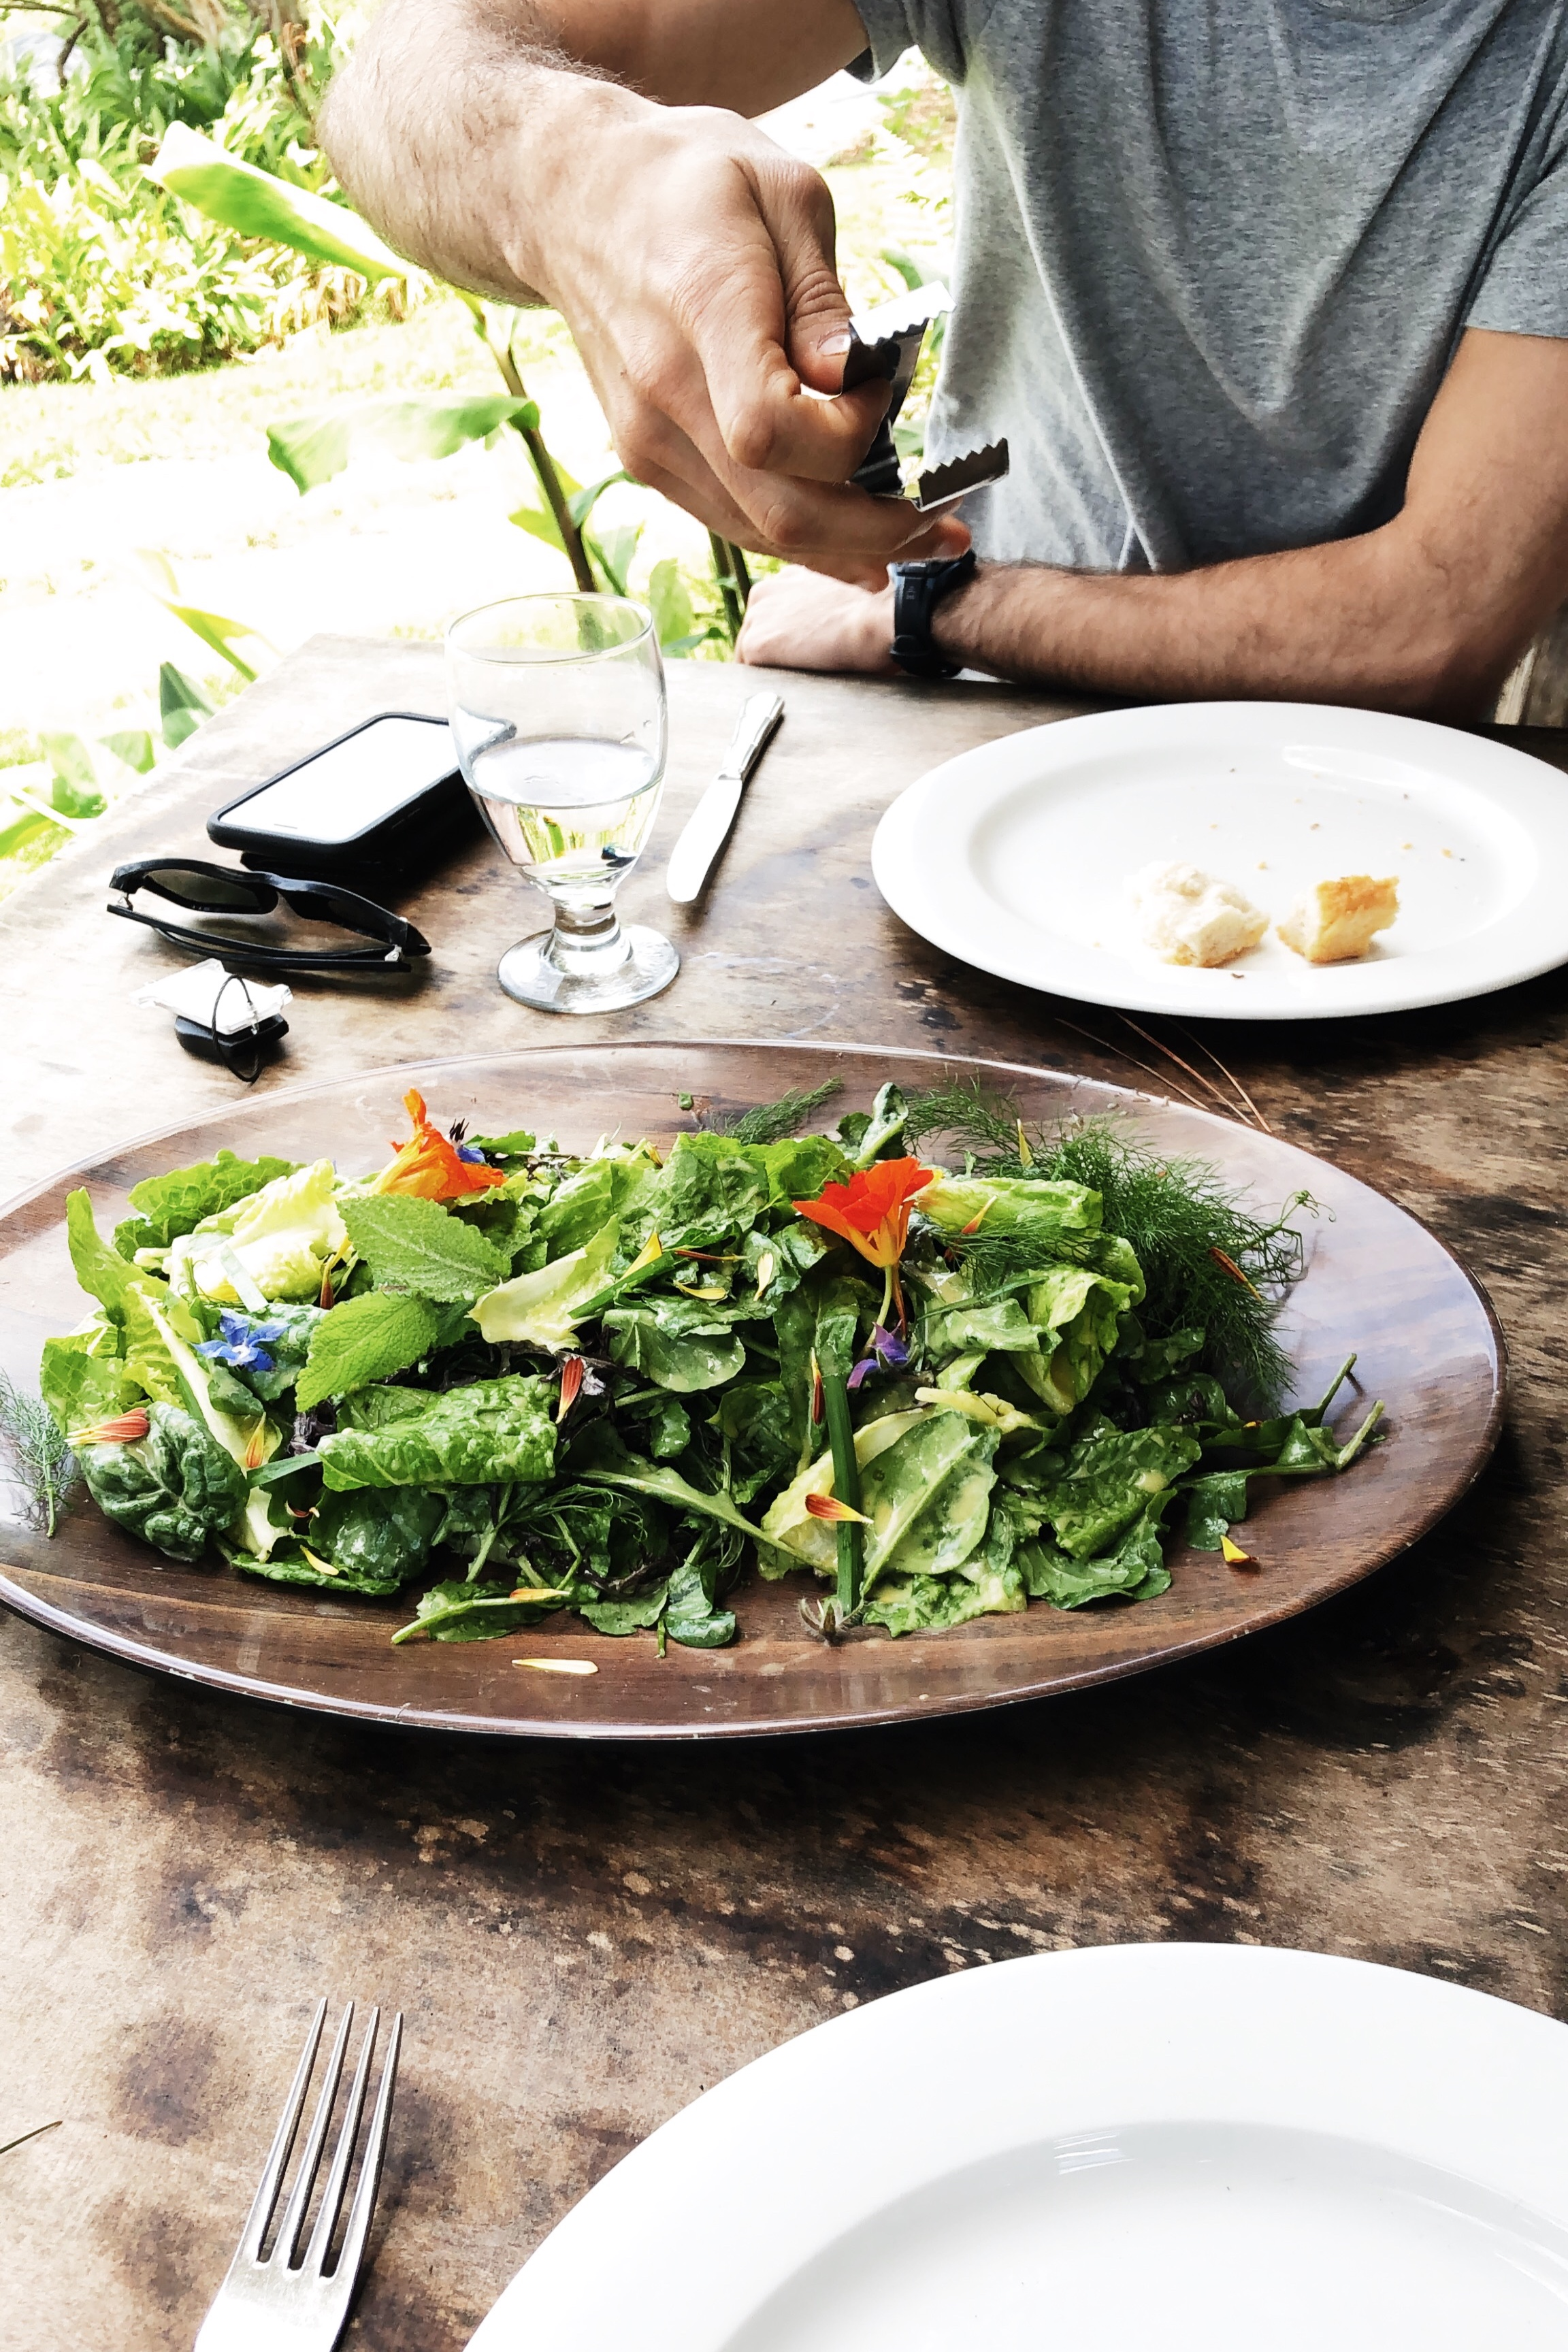 oofarm-maui-photo-by-samantha-look.jpg